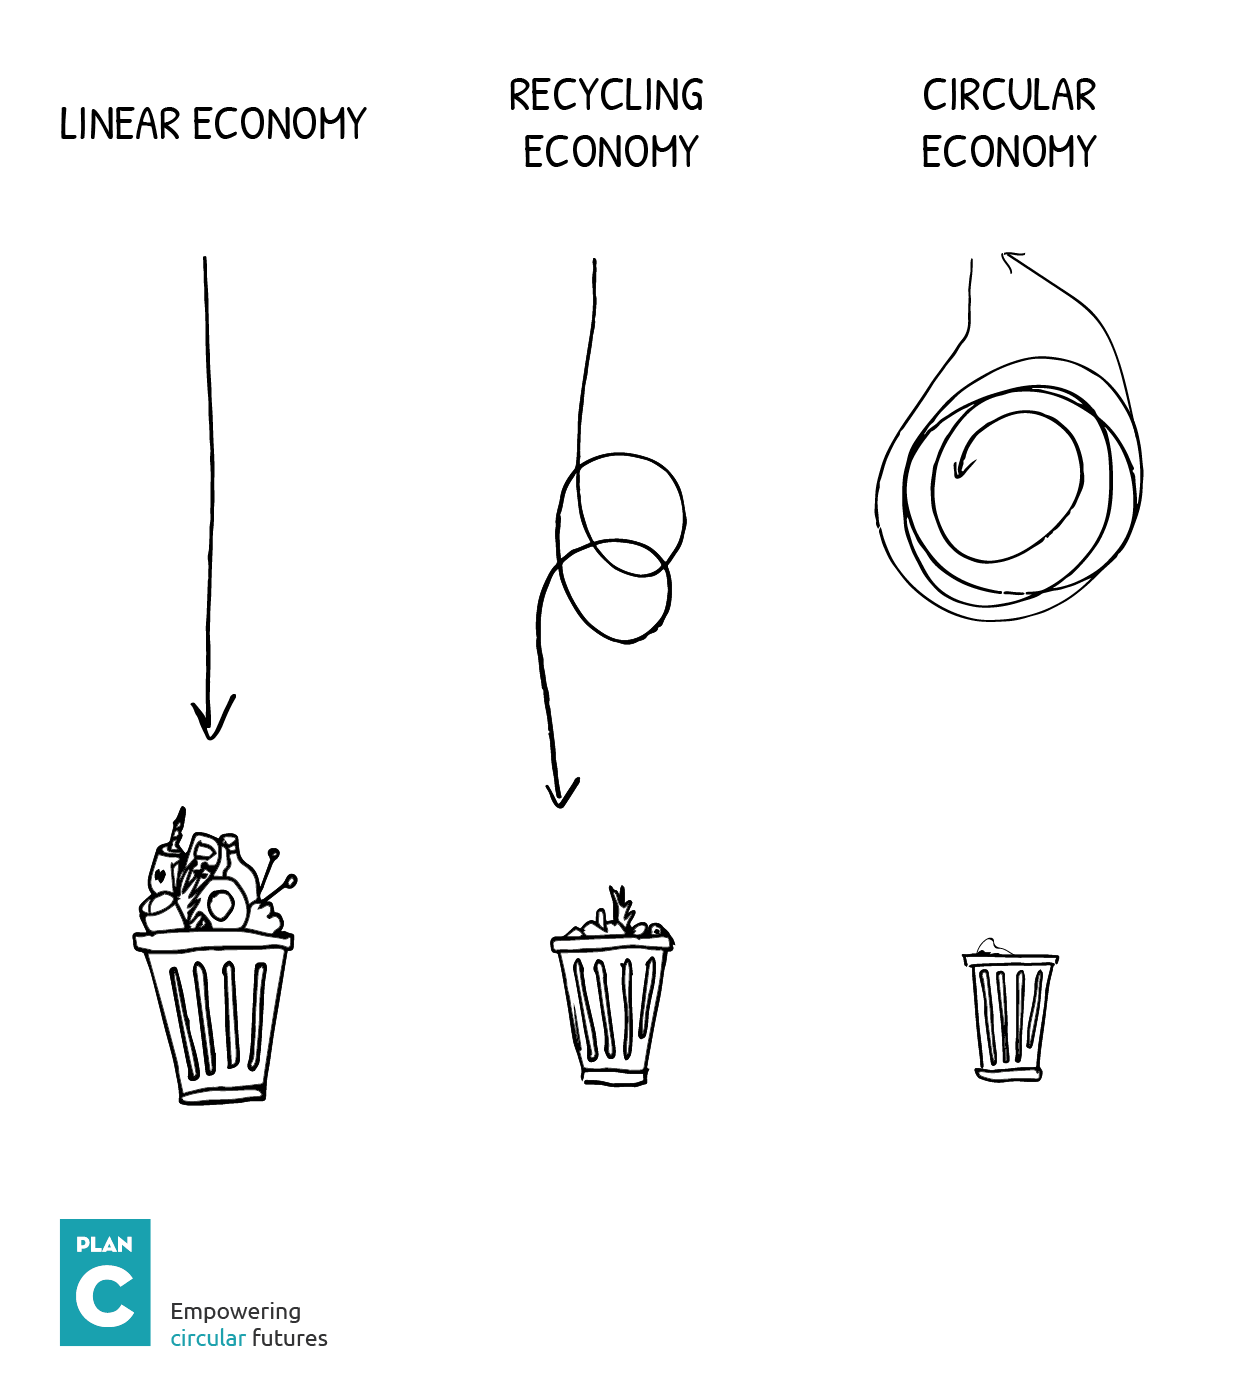 Pin By Gerardo Cornejo Velez On Circular Economy